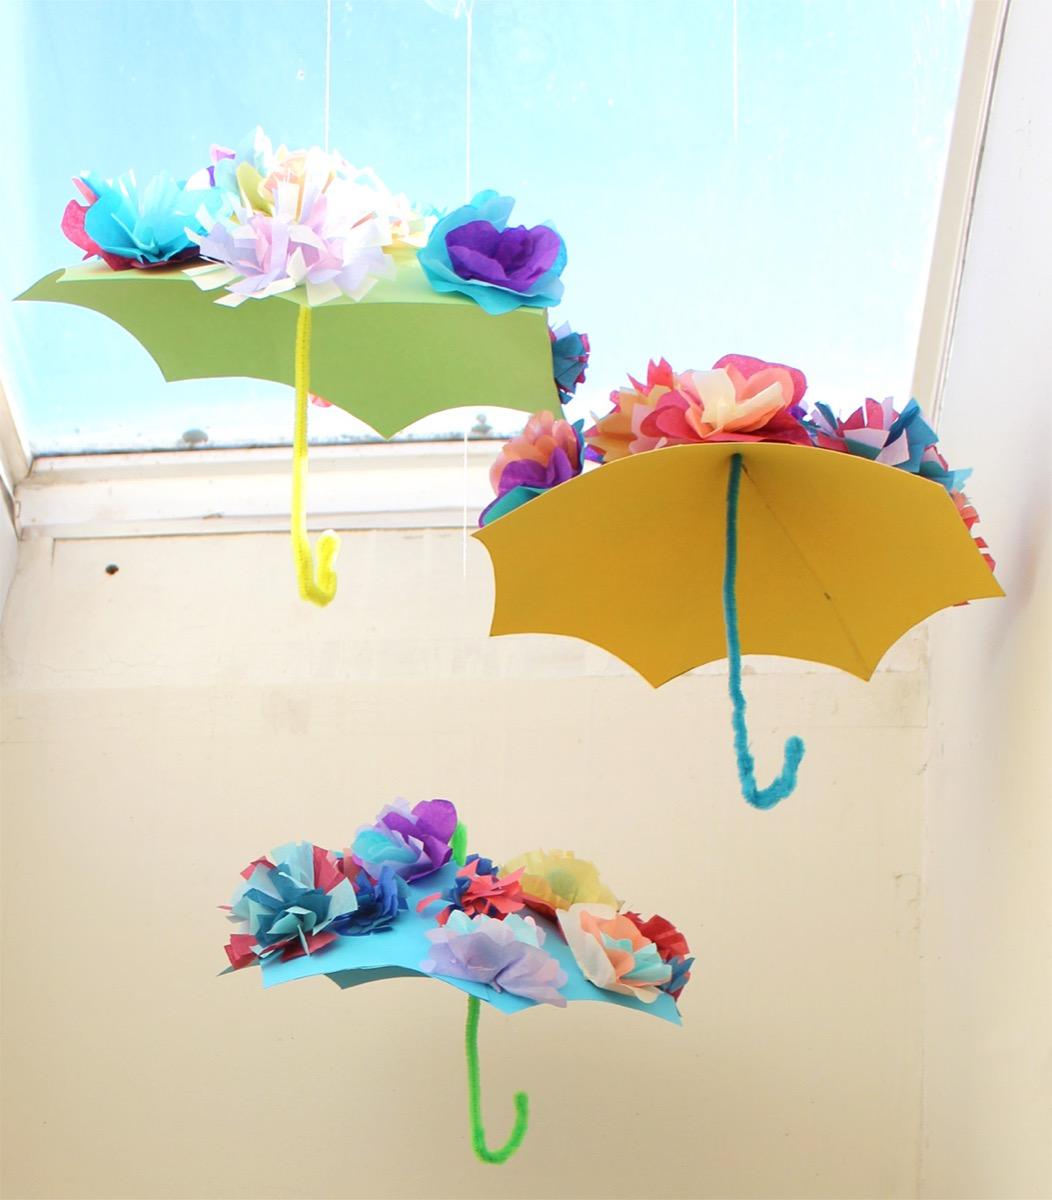 May Flower Umbrellas - Final